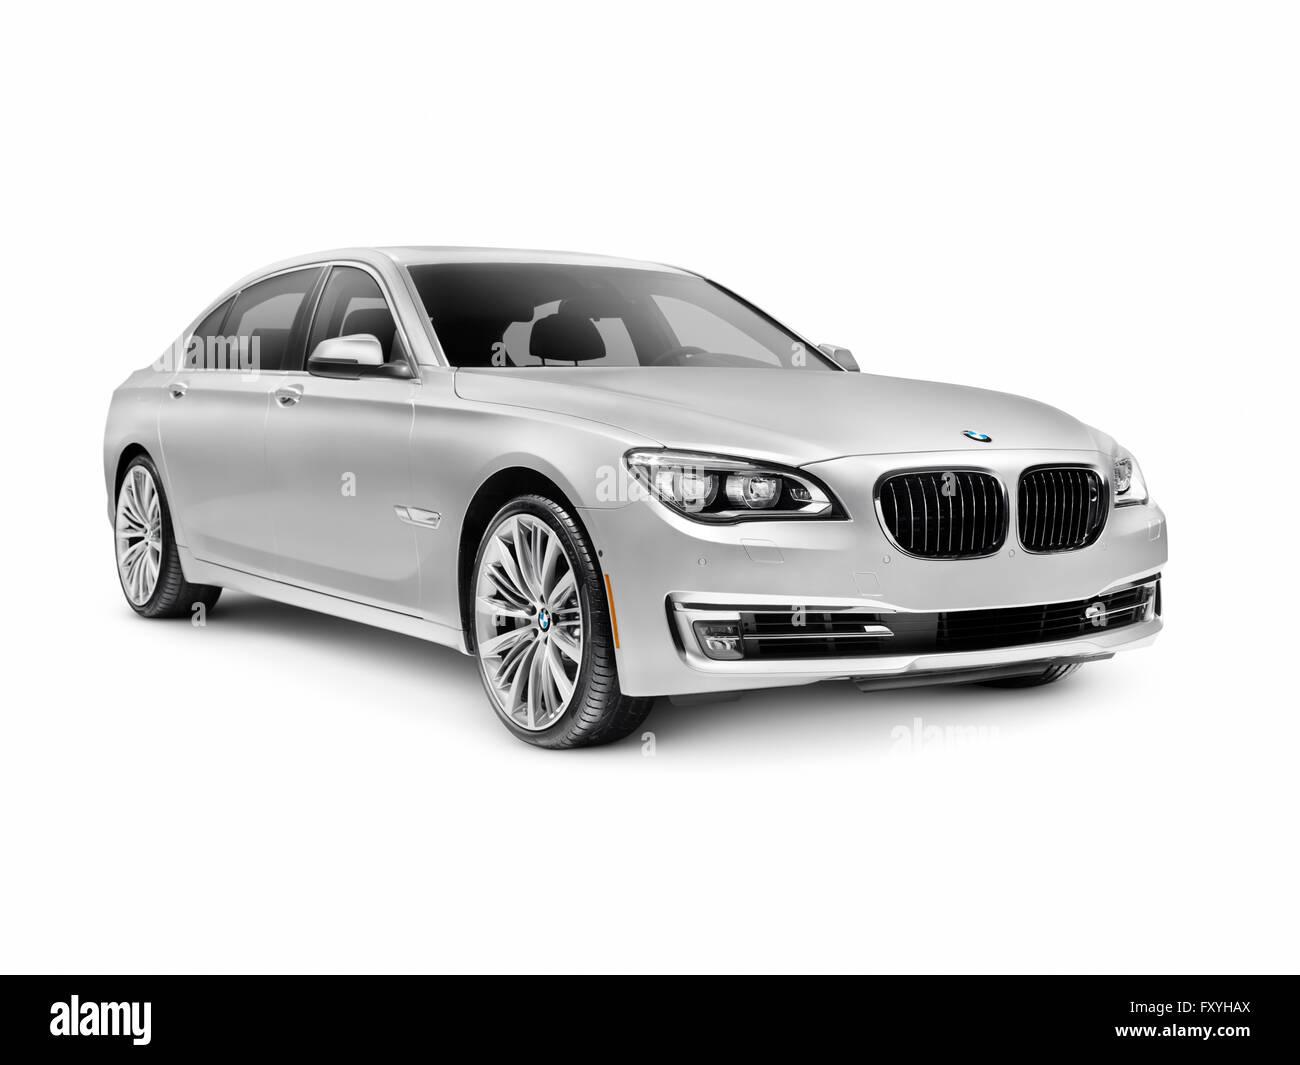 2015 BMW 7 series 750Li, silver, luxury car - Stock Image